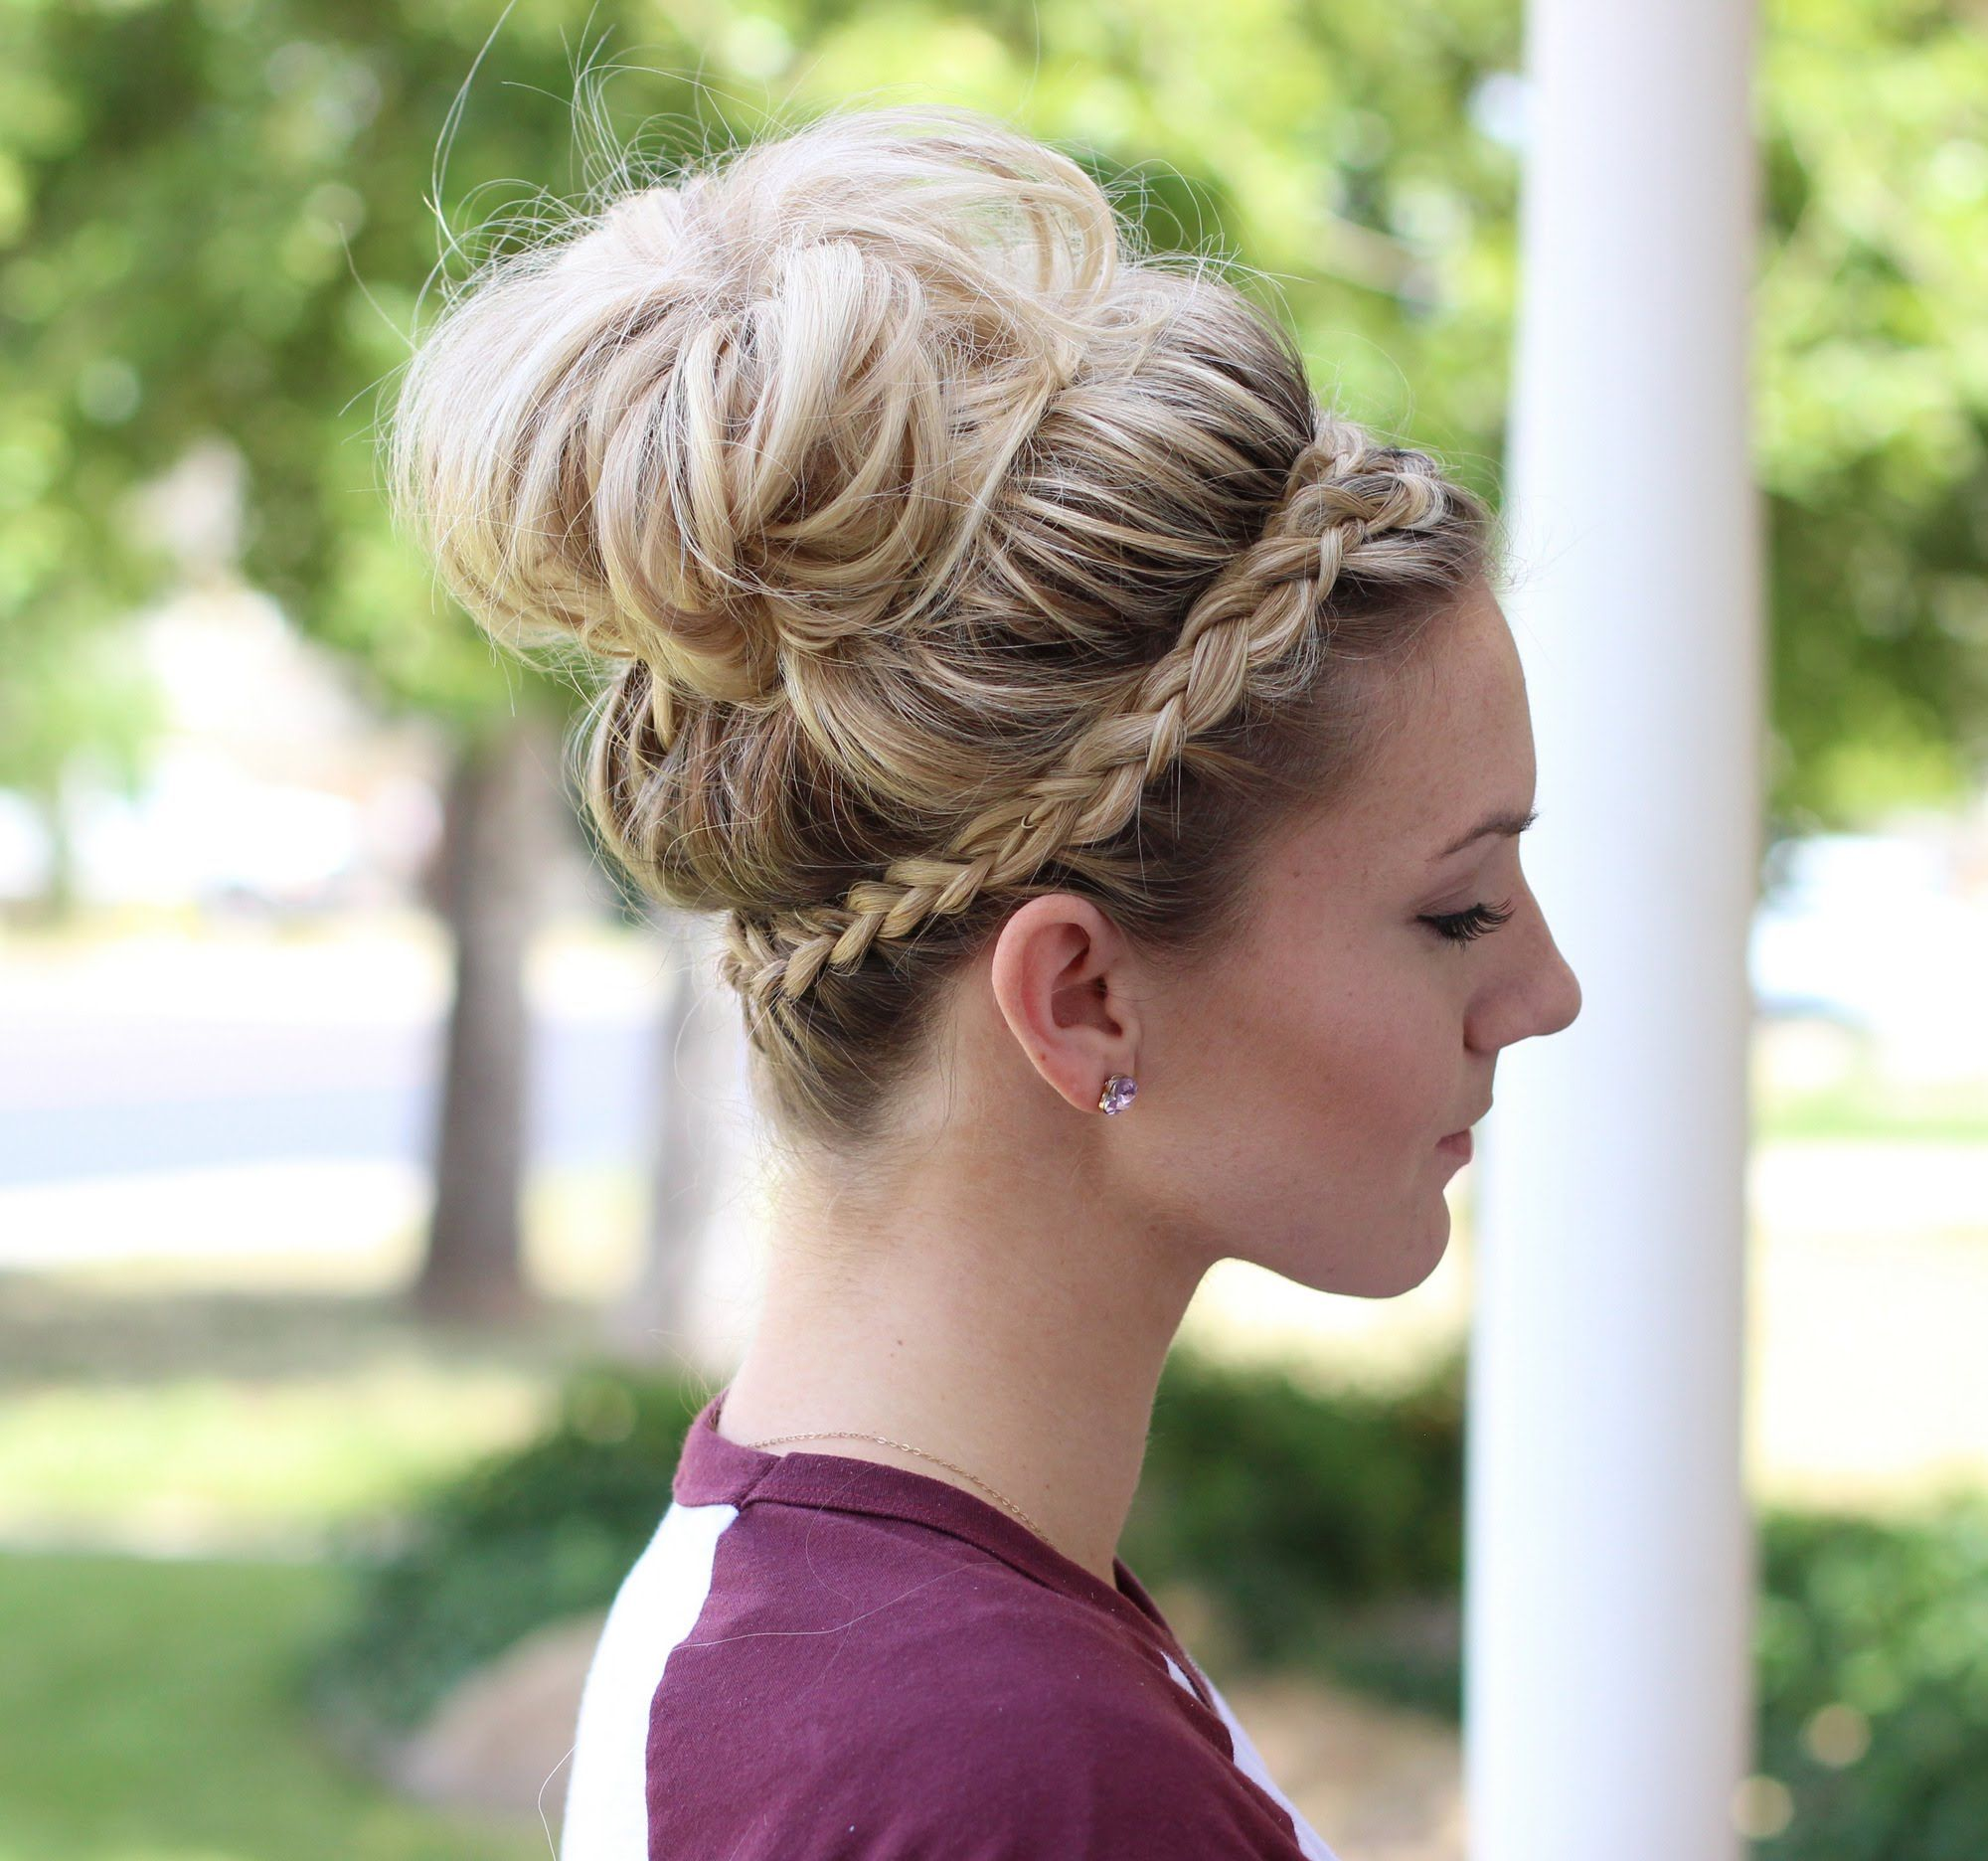 How To Crown Braid Messy Bun Braided Headband Hairstyle